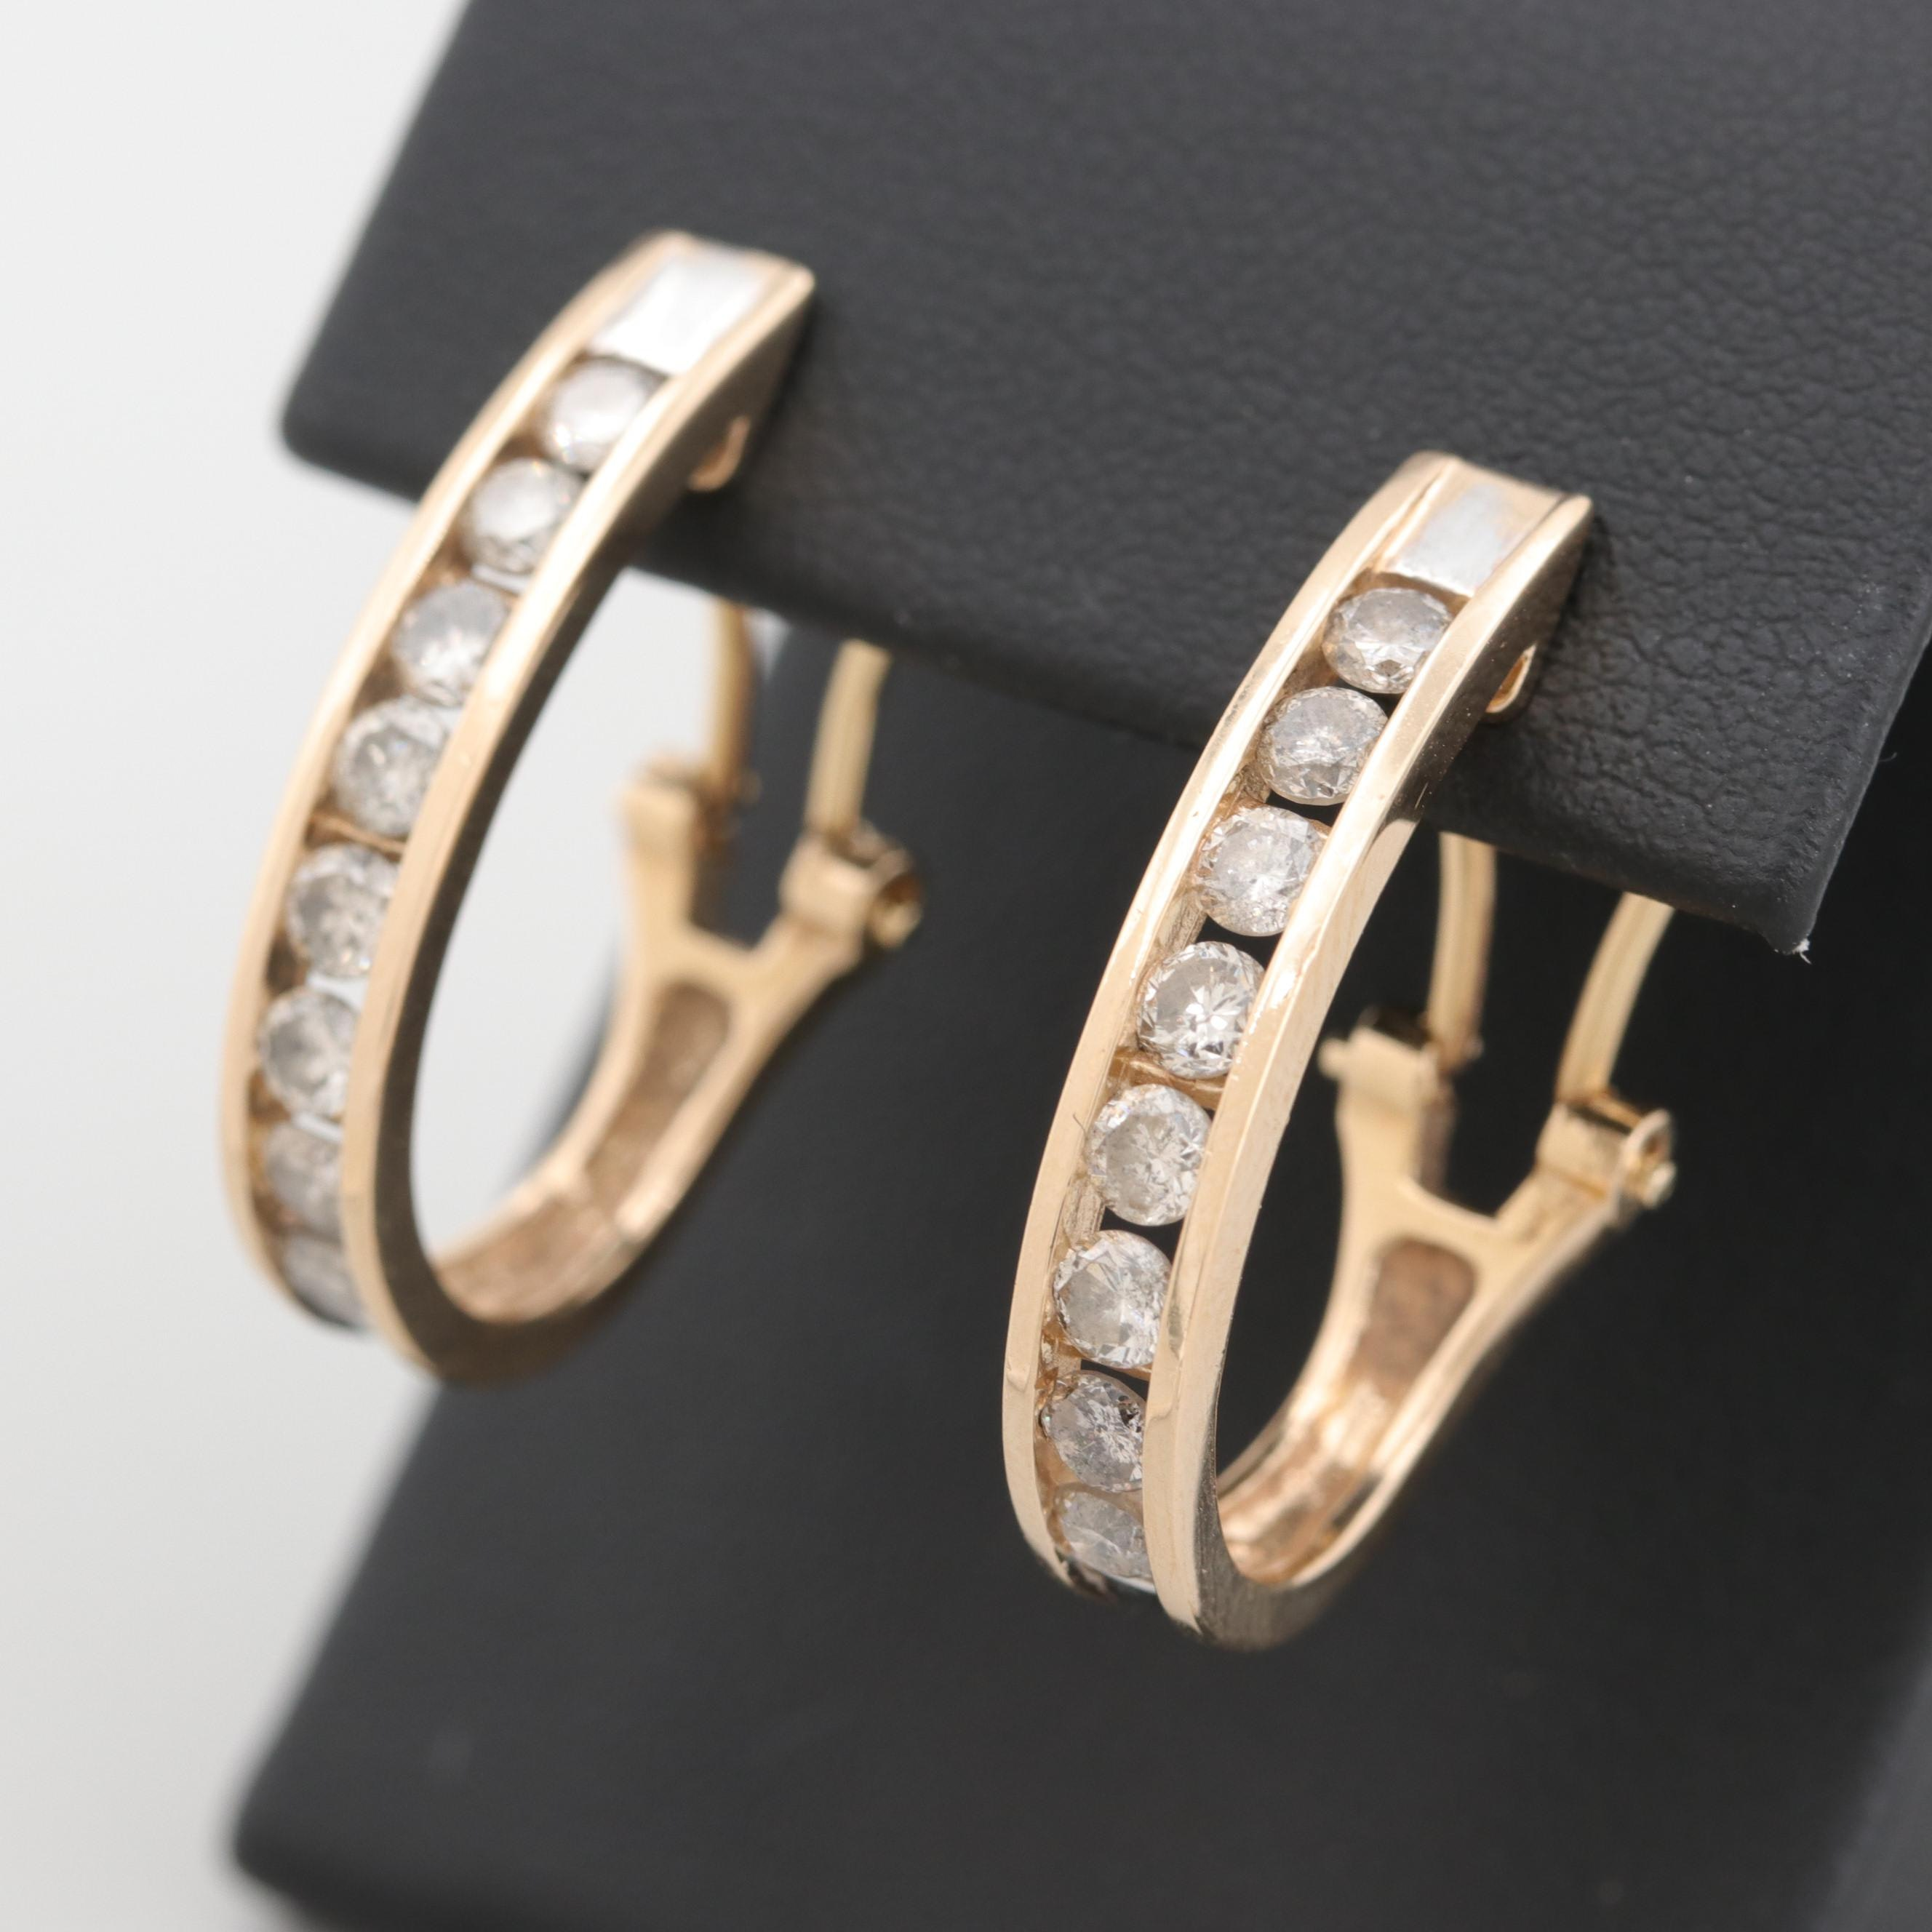 14K Yellow Gold 1.28 CTW Diamond Earrings